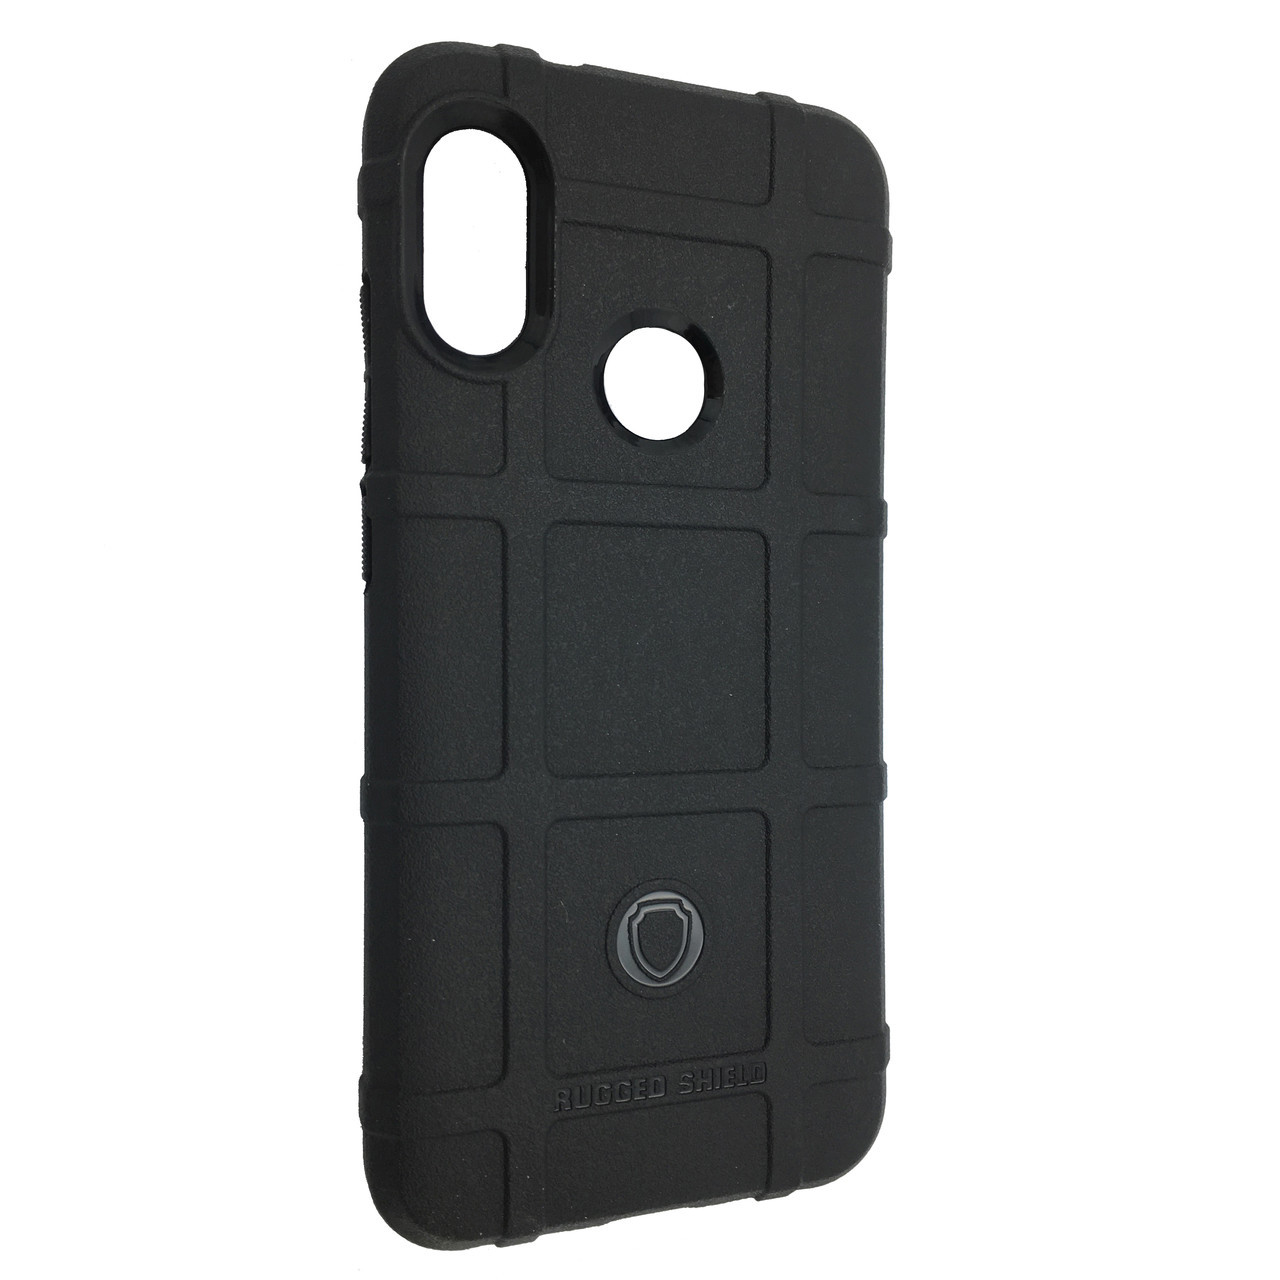 Чехол Rugged Shield Xiaomi Mi A2 Lite (Redmi 6 Pro) (black)